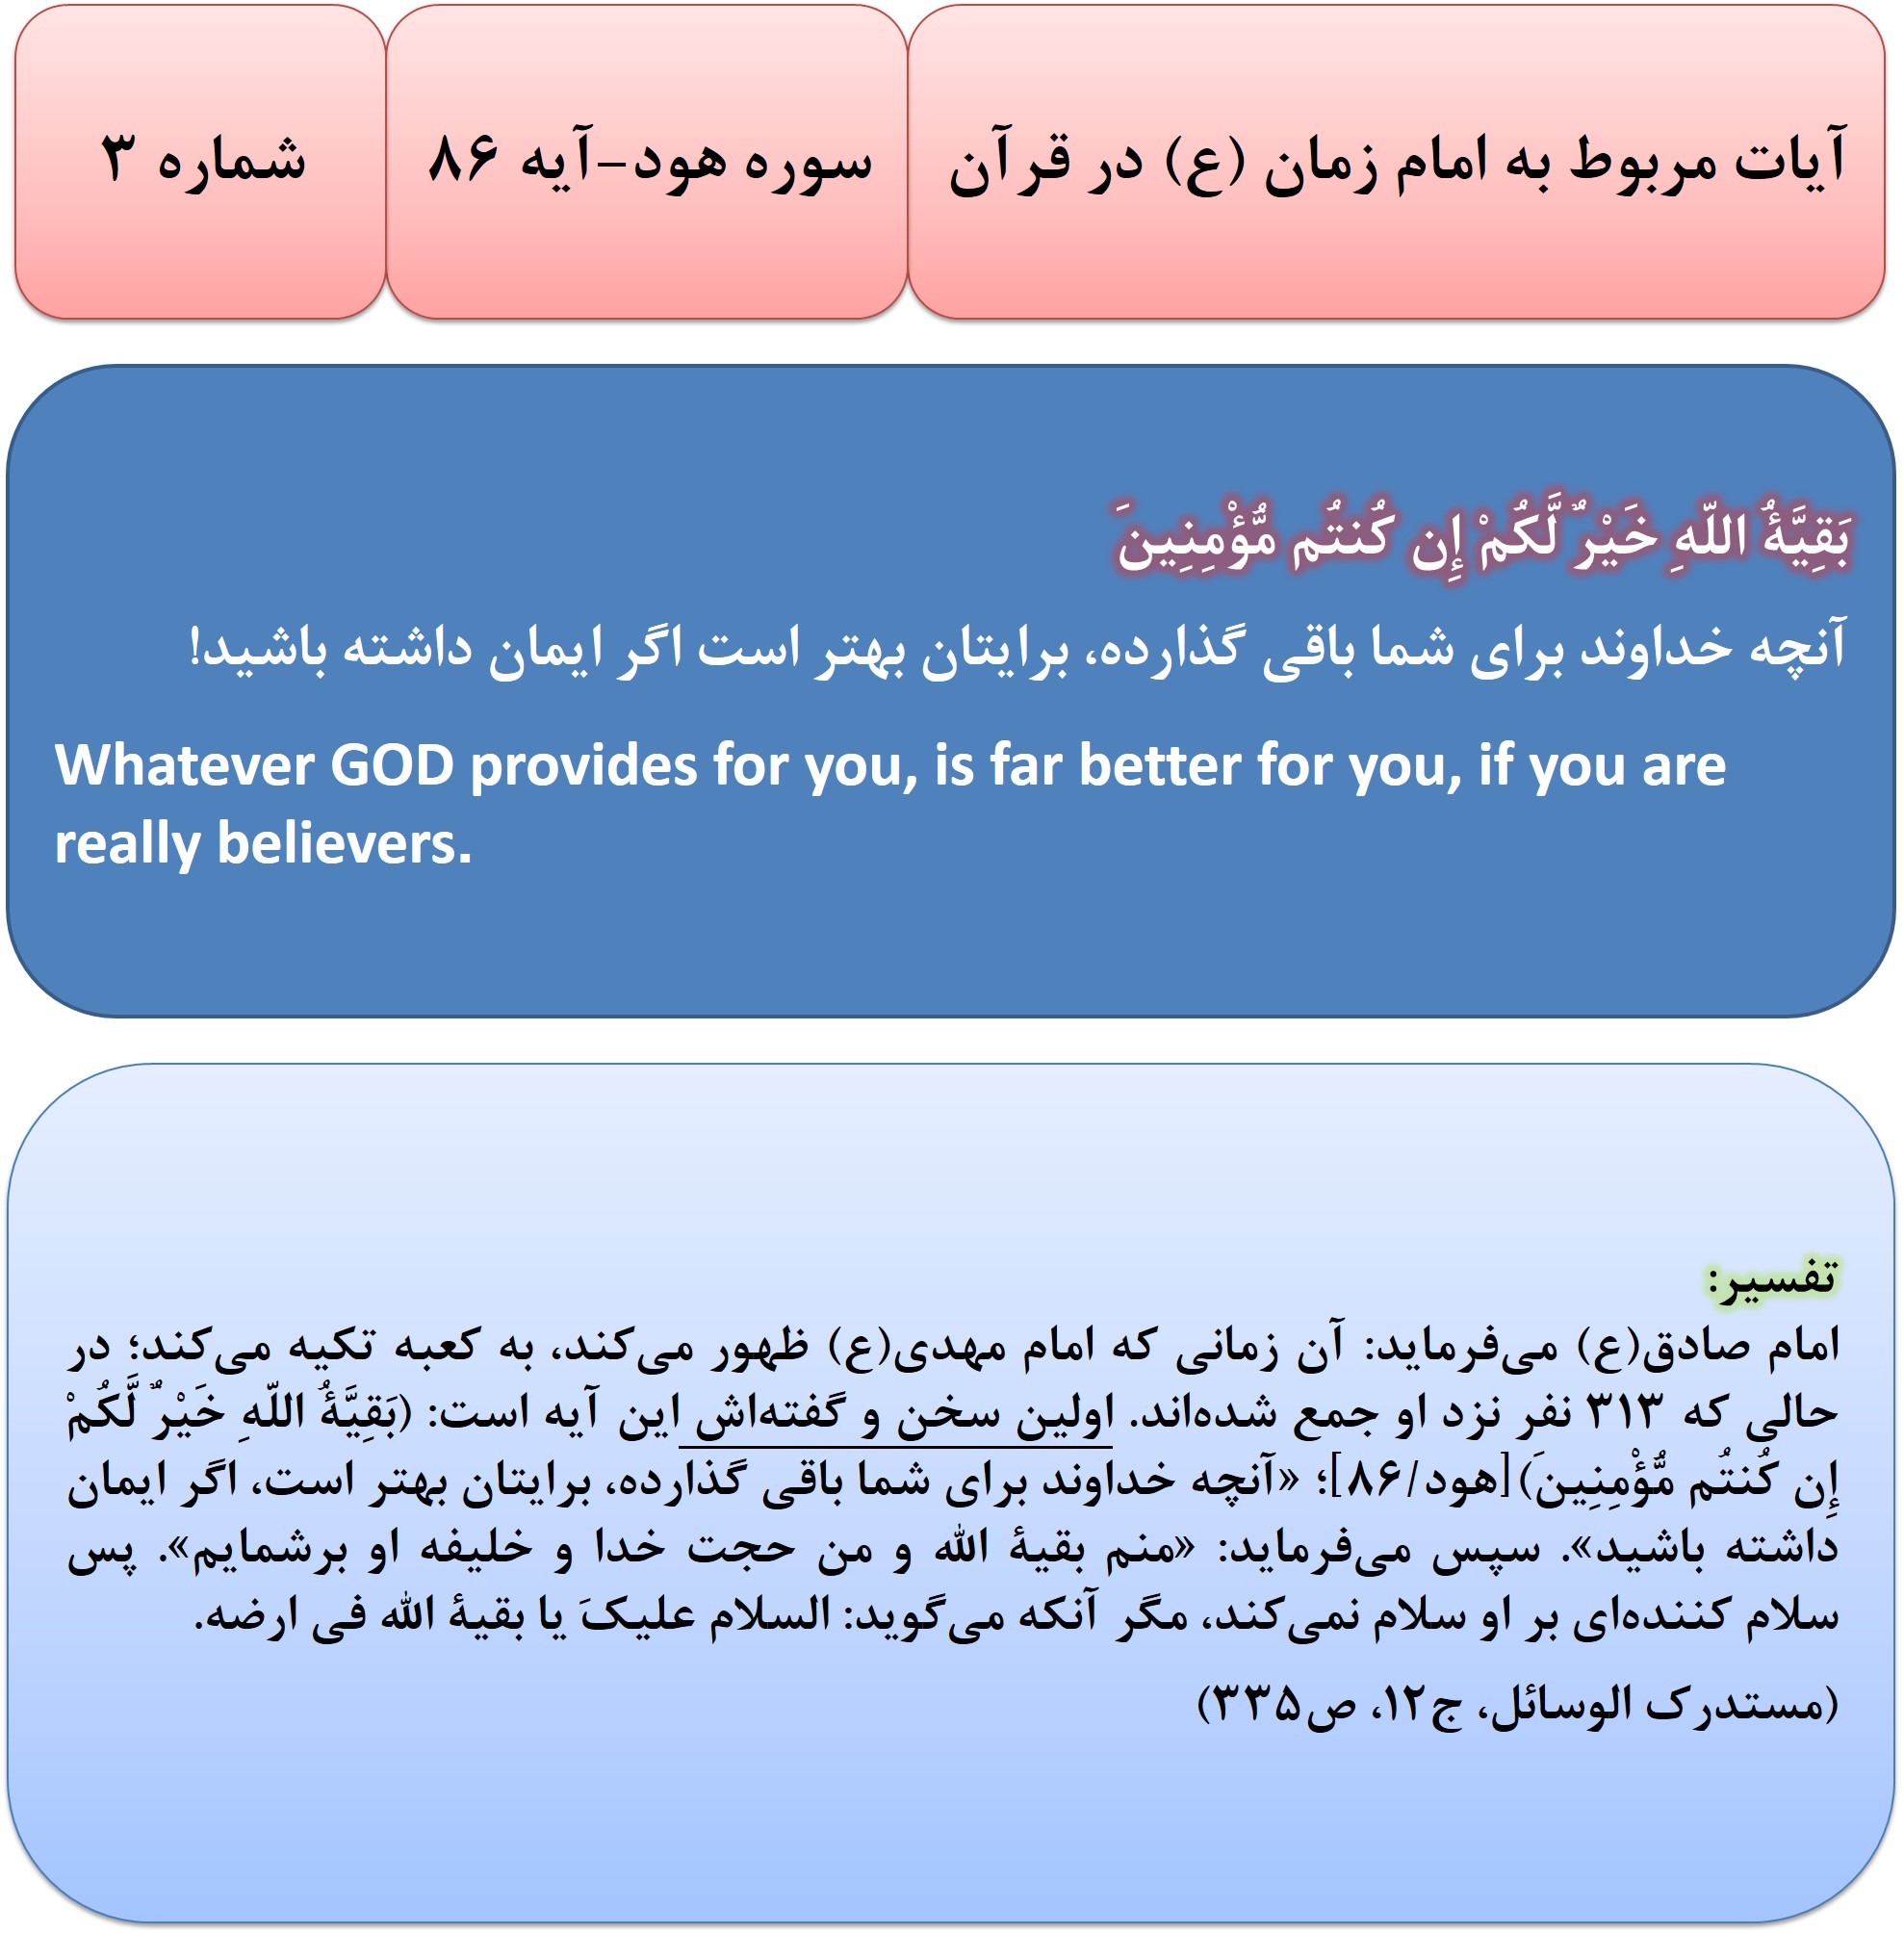 http://bayanbox.ir/view/3549543024167332112/Mahdi-In-Quran-3.jpg